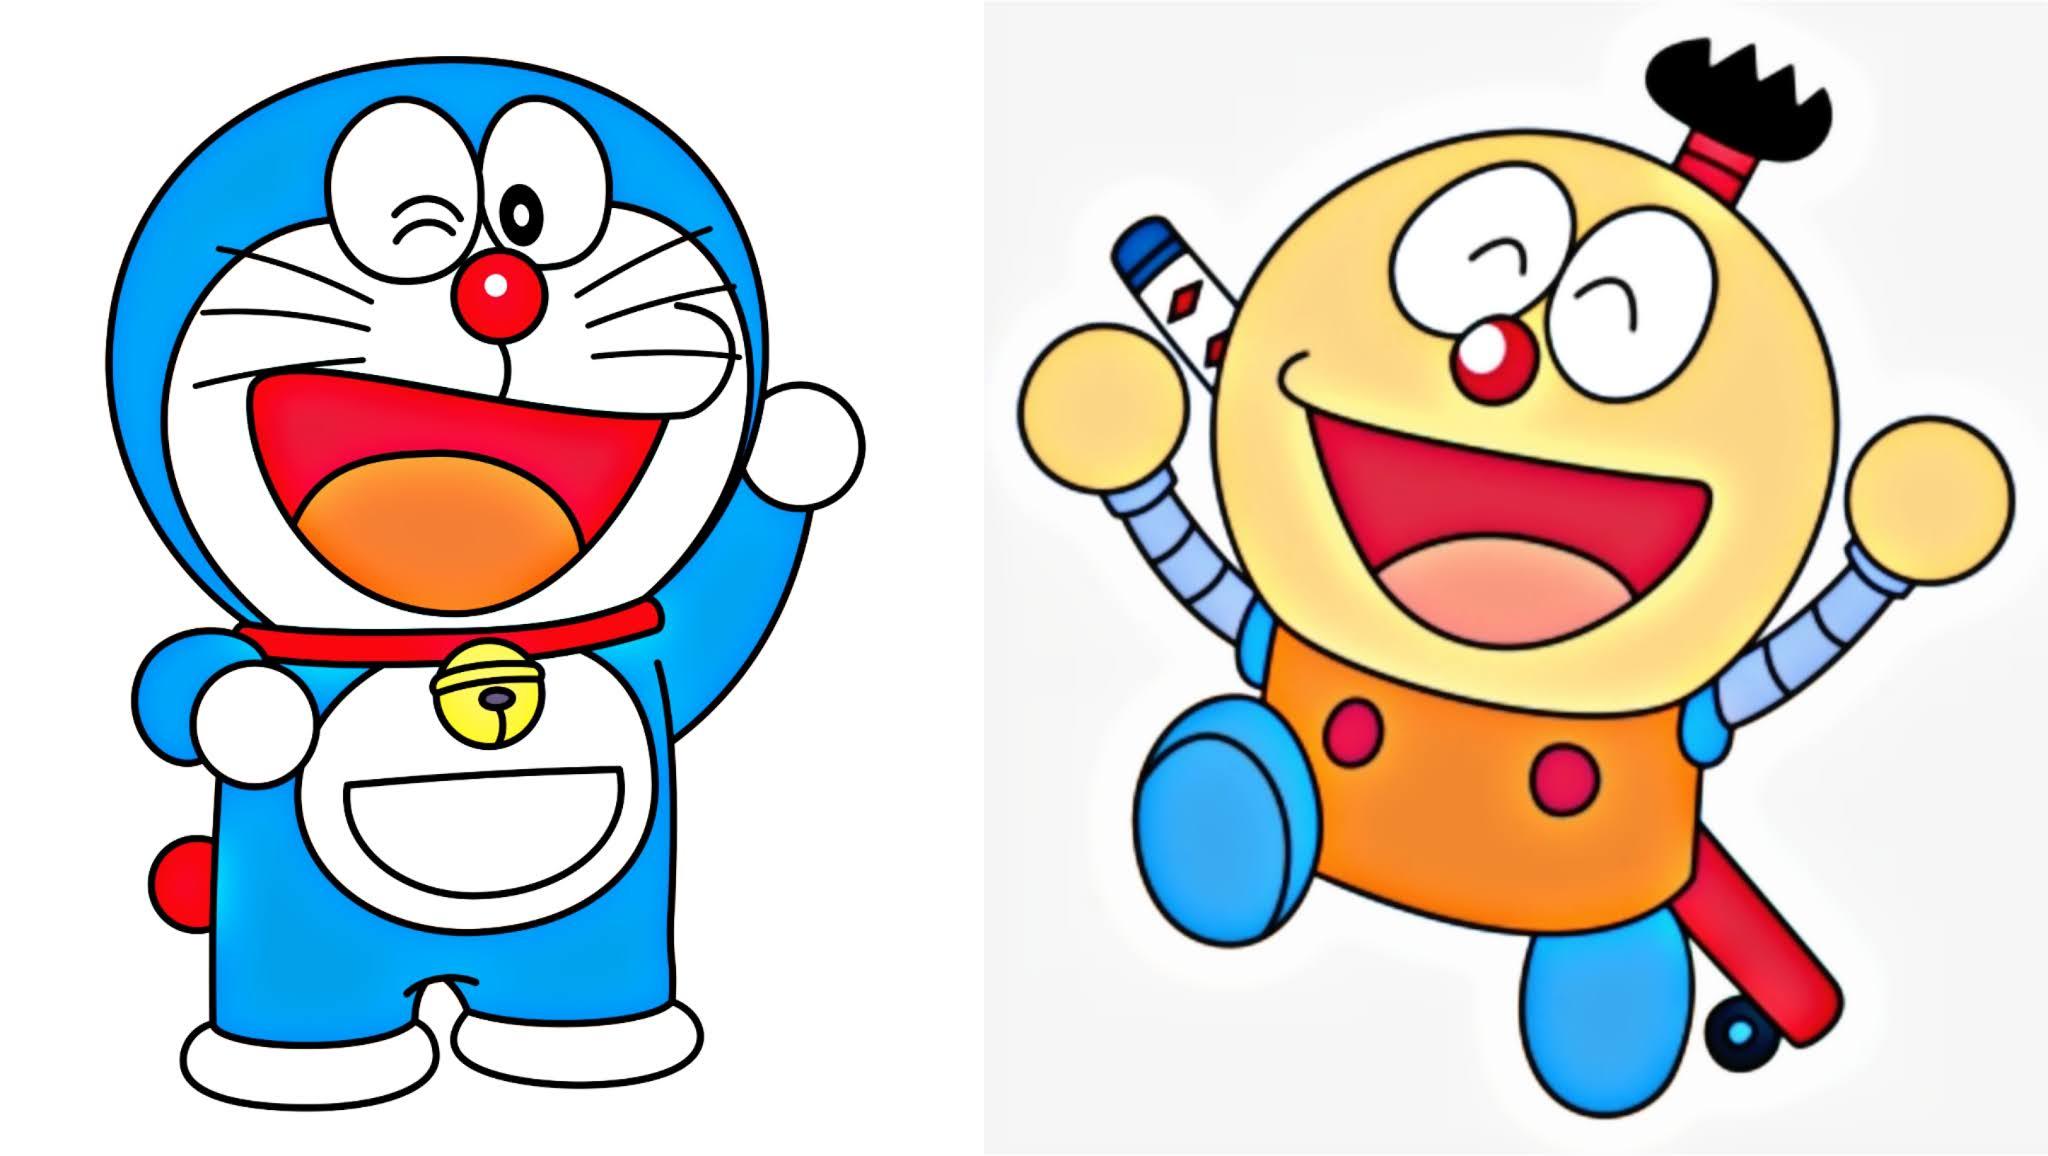 Why-Doraemon-and-Kiteretsu-are-similar?-Doraemon-Vs-Kiteretsu-Interesting-facts-about-Doraemon-and-Kiteretsu.